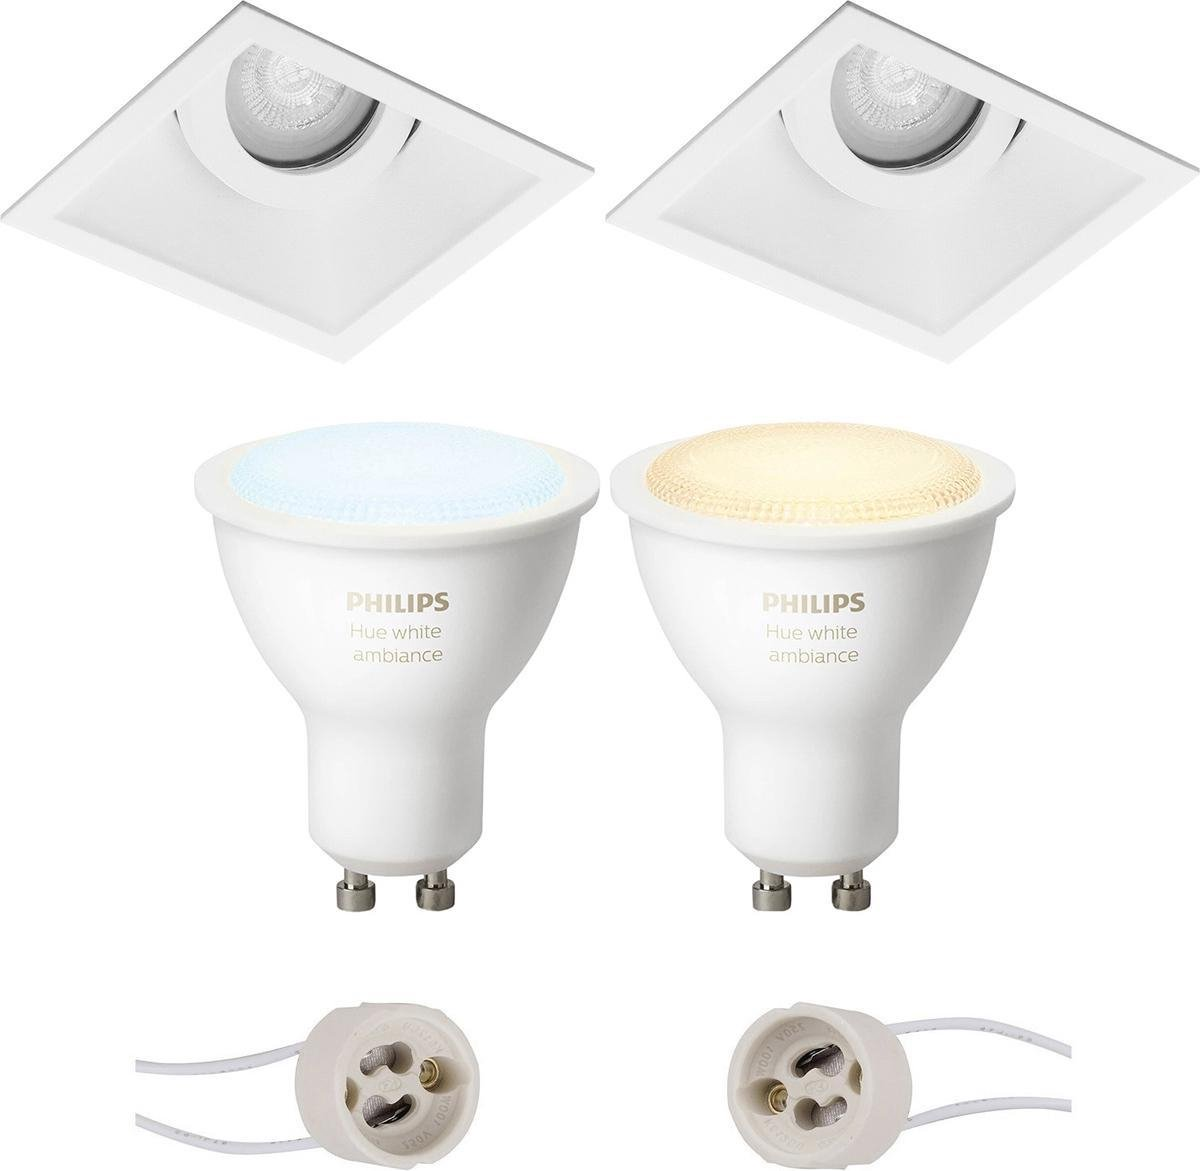 PHILIPS HUE - LED Spot Set GU10 - White Ambiance - Bluetooth - Pragmi Zano Pro - Inbouw Vierkant - Mat Wit - Kantelbaar - 93mm